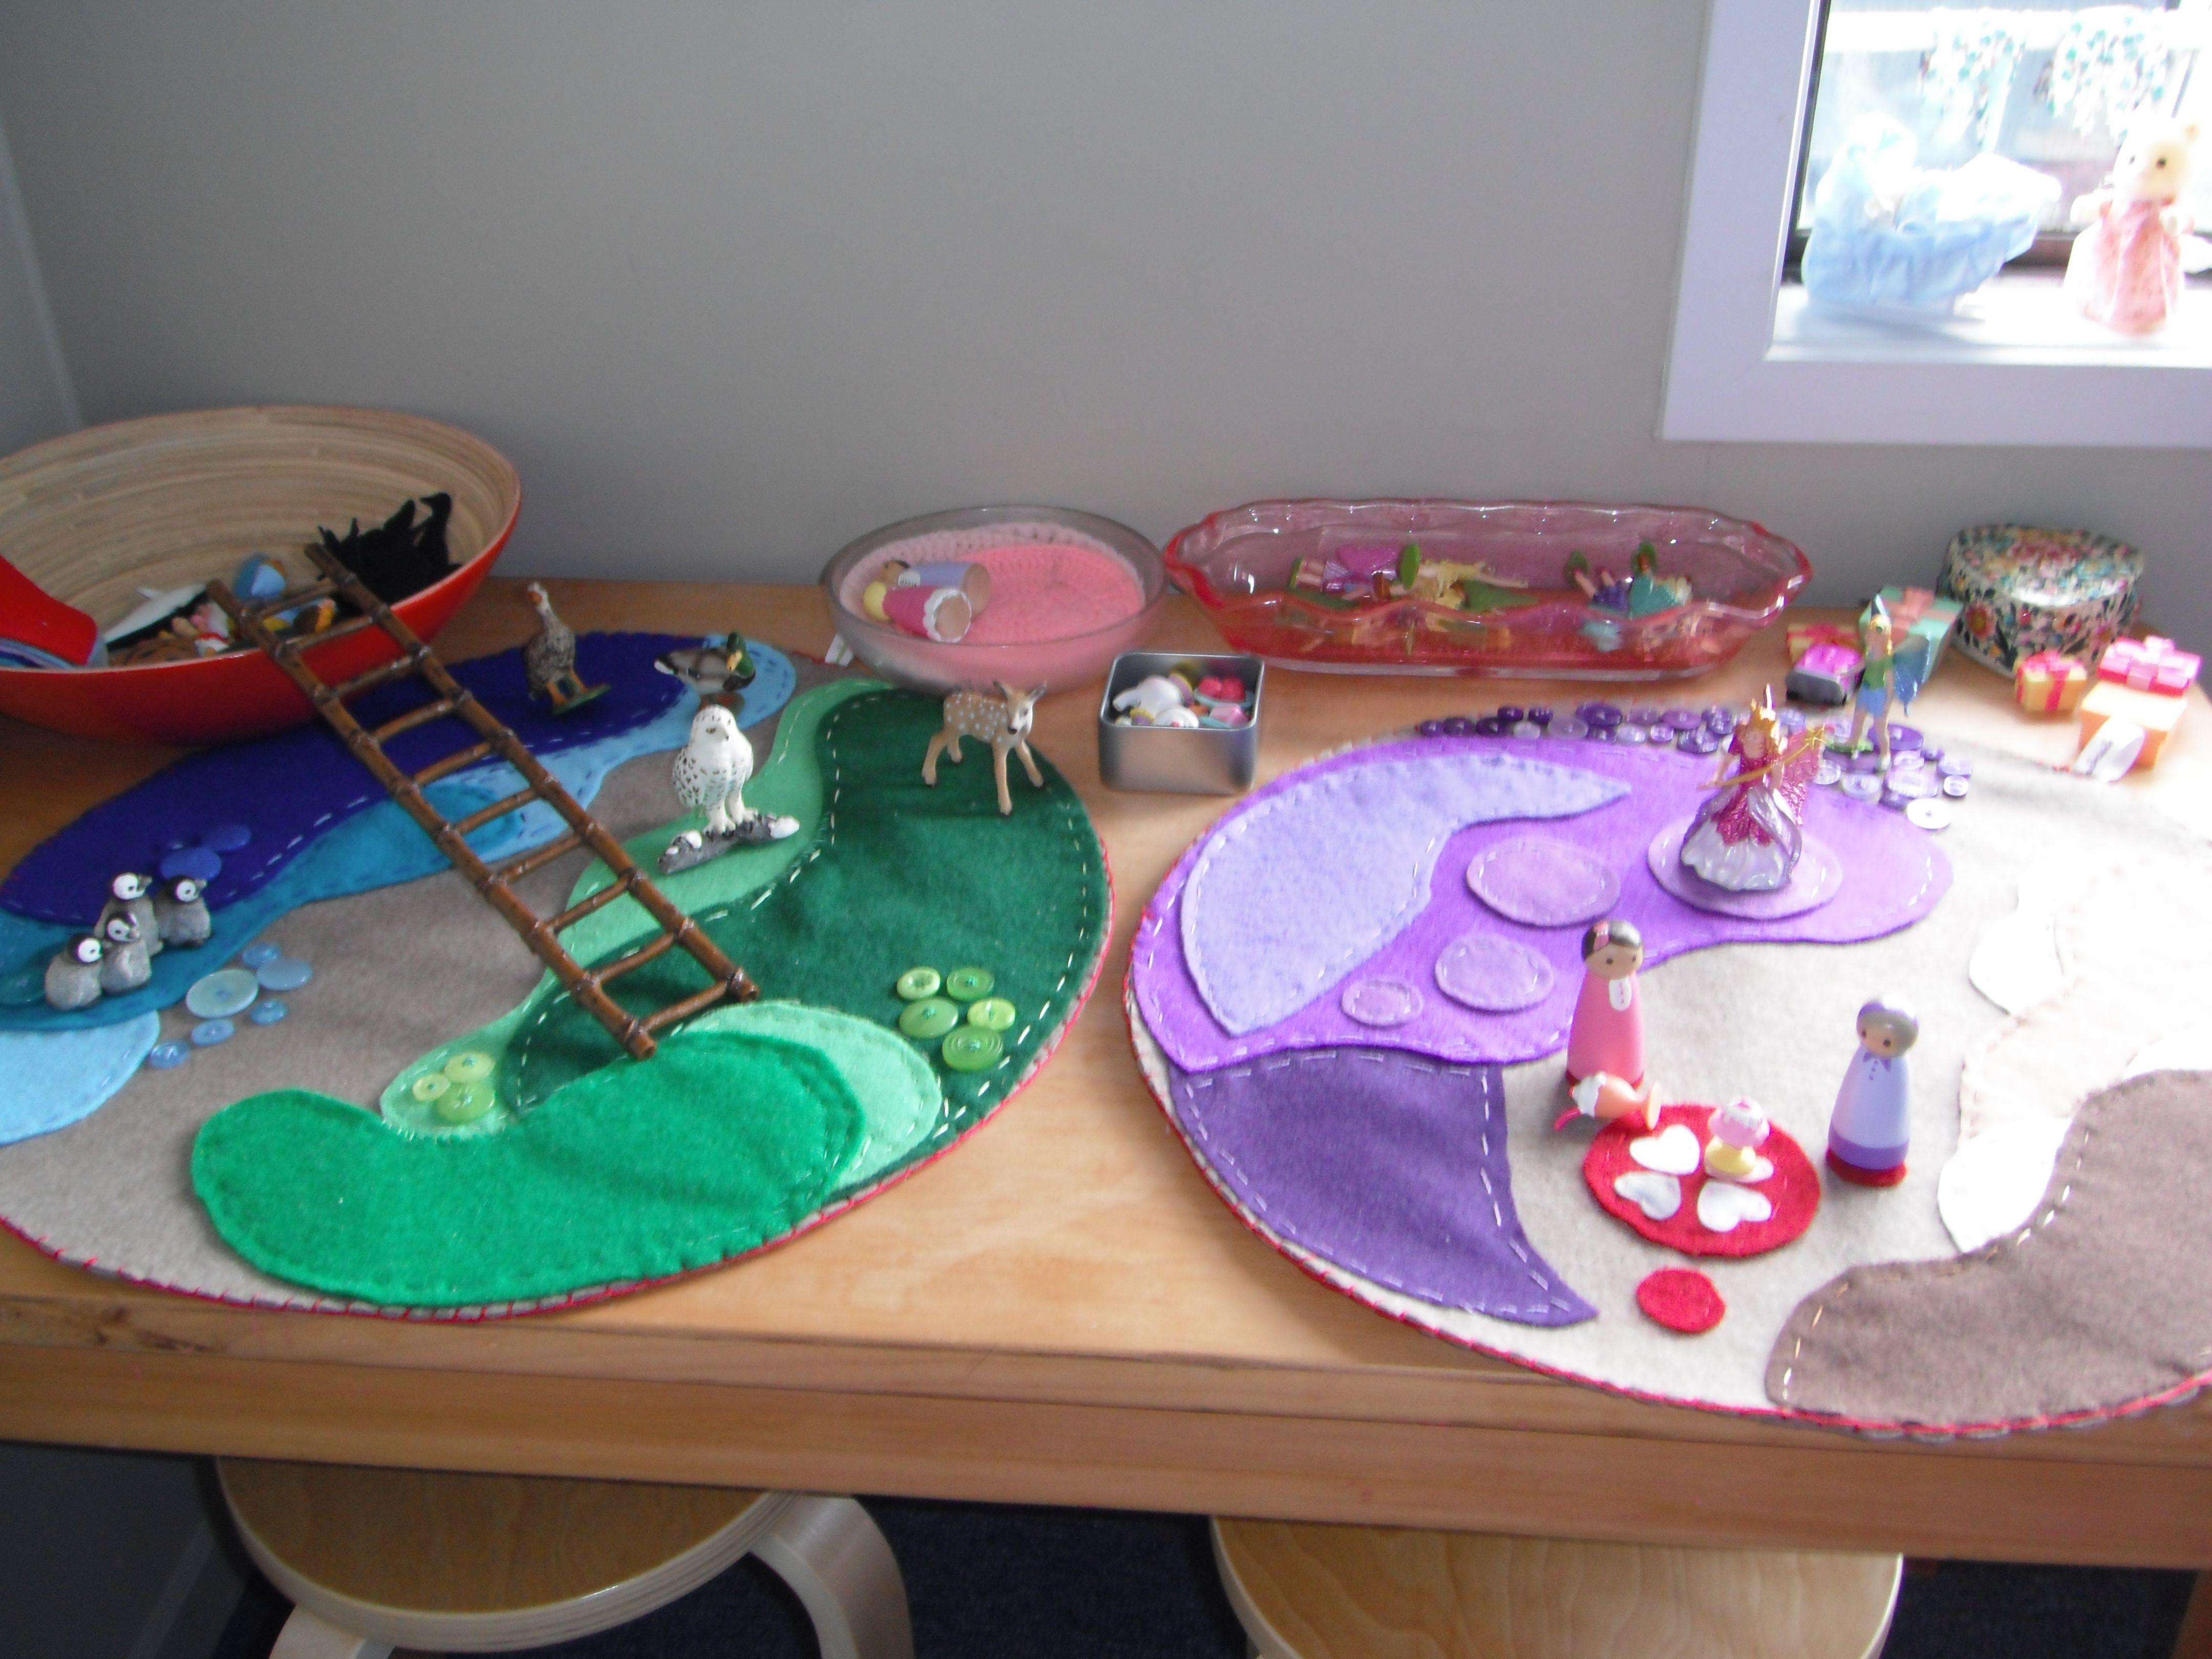 Pin By Stephanie Furton On Peg Dolls Felt Play Mat Felt Toys Kids Playing